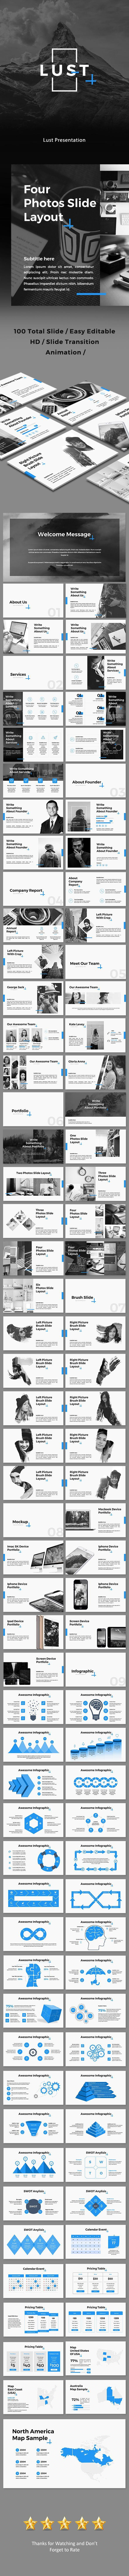 Lust Google Slides | Presentation templates, Keynote and Template